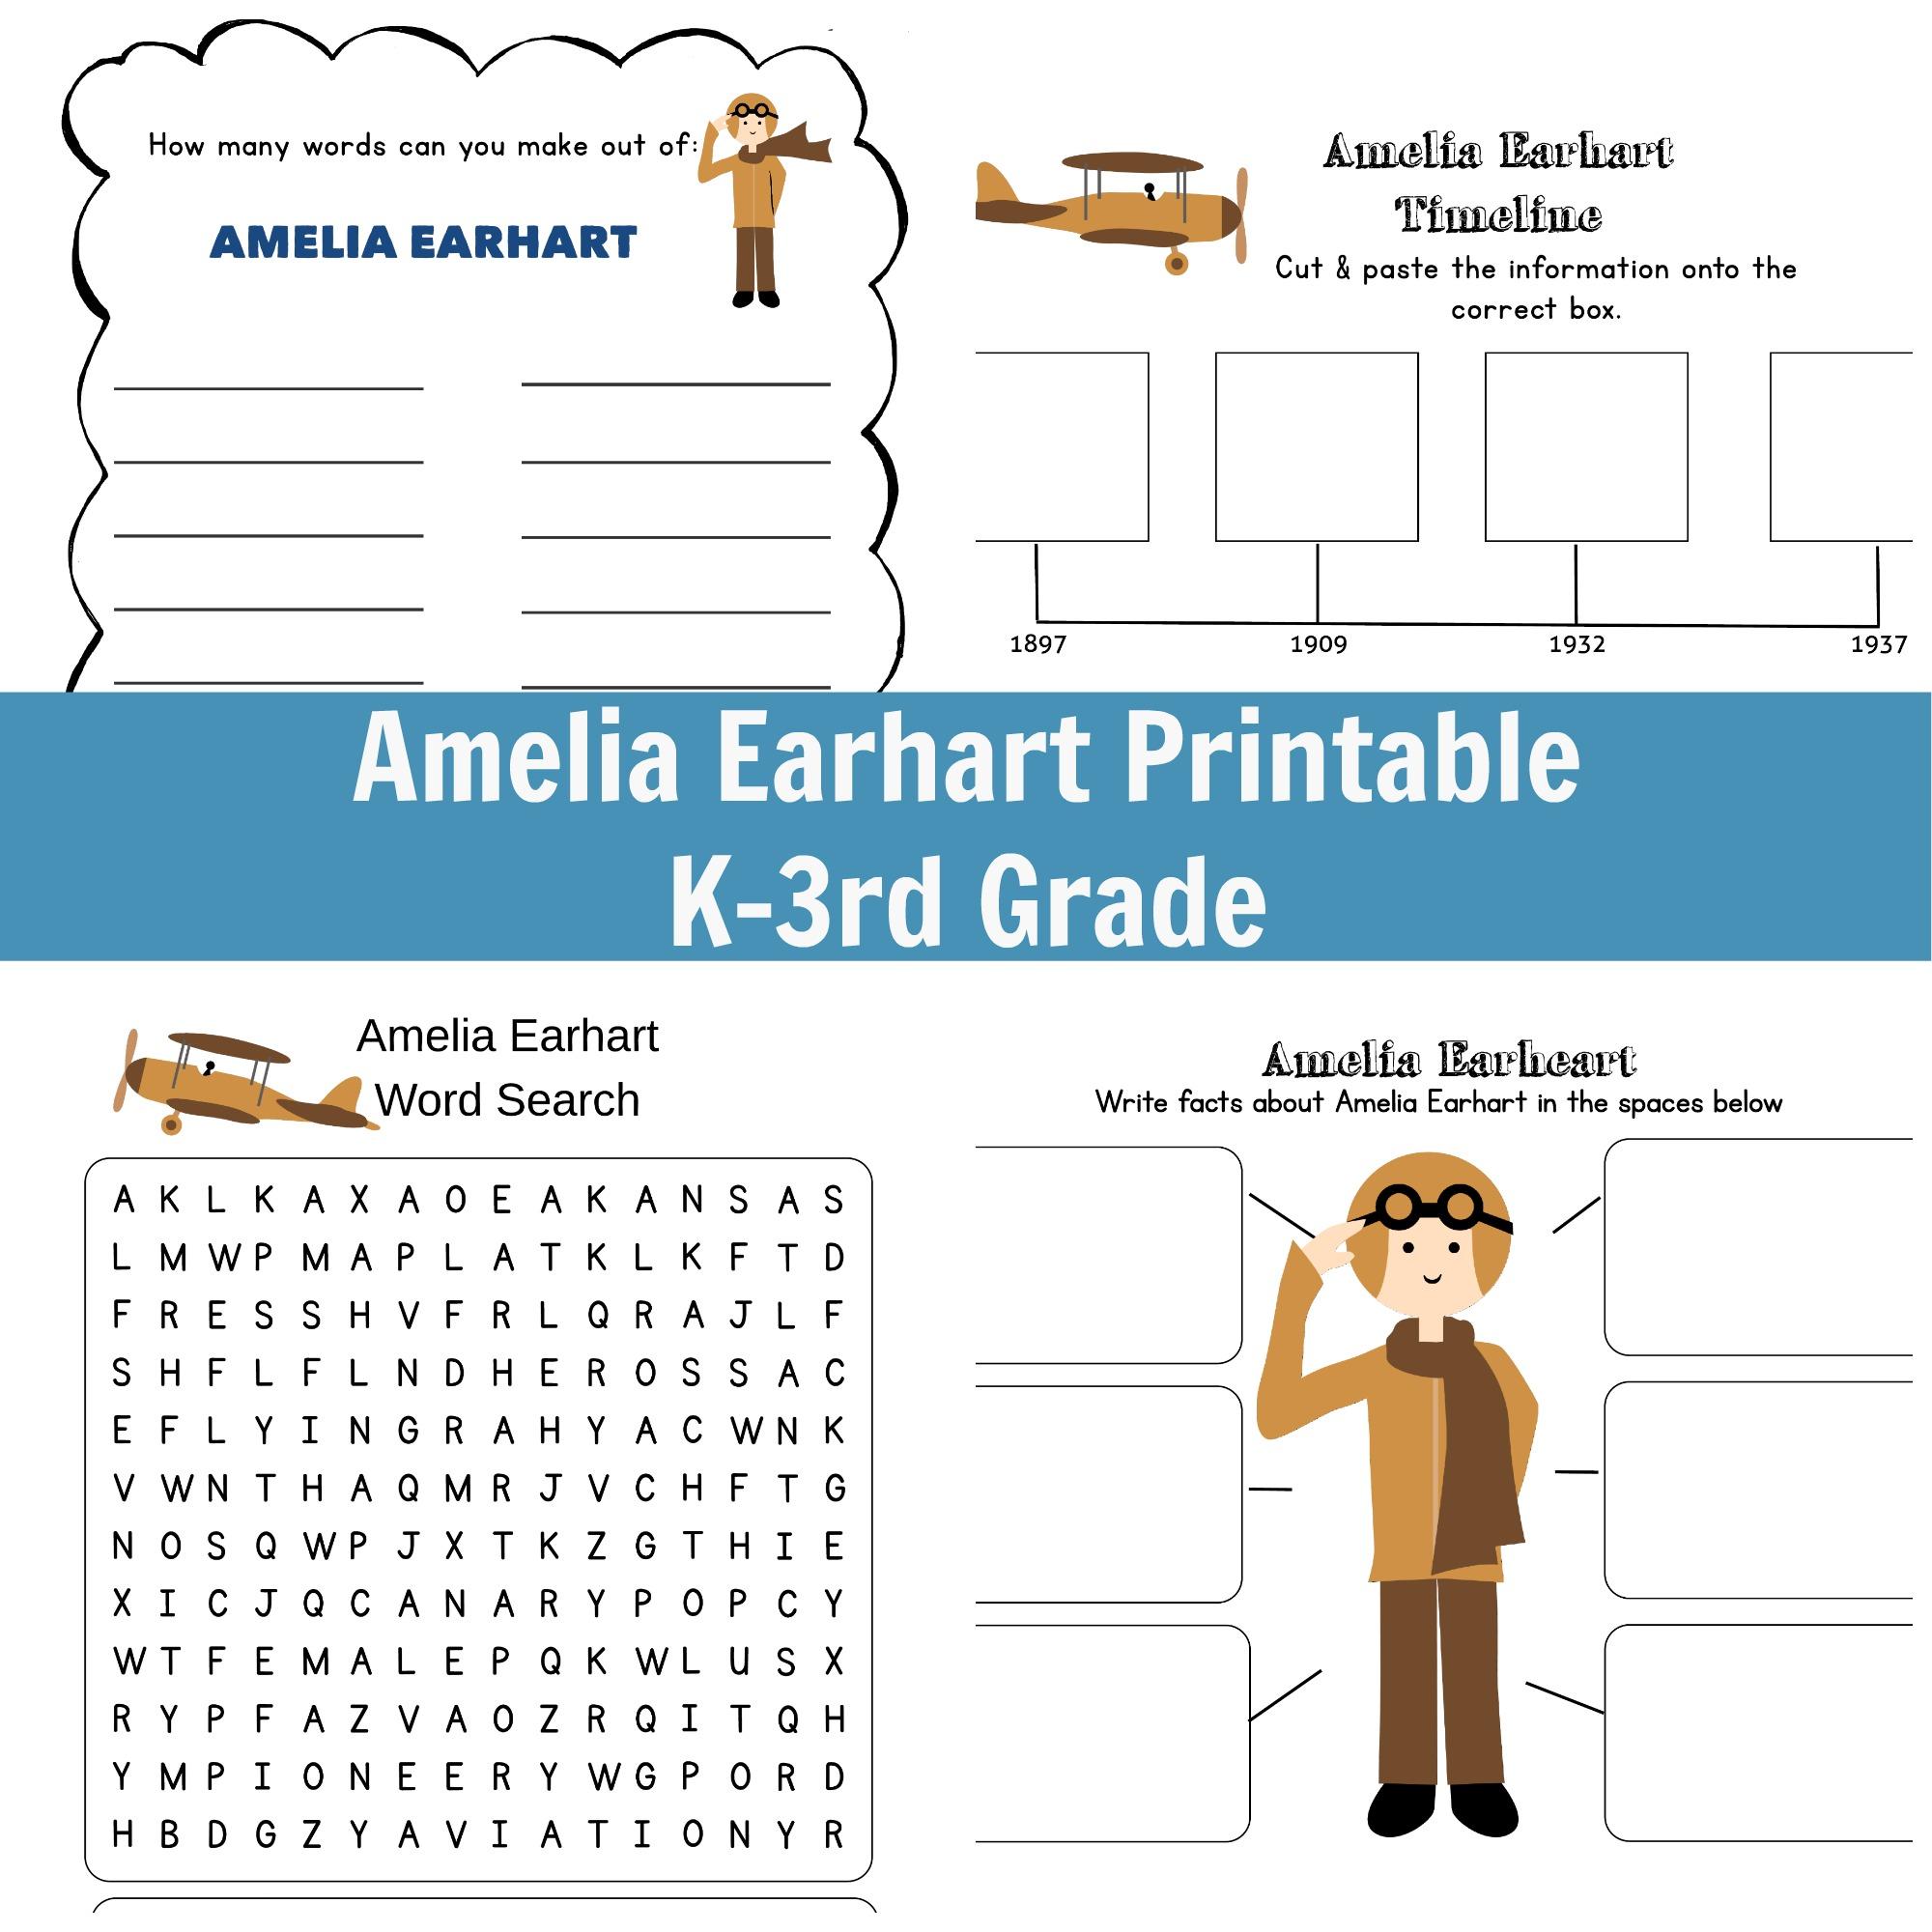 Amelia Earhart Printable - Grades K-3 [ 2000 x 2000 Pixel ]